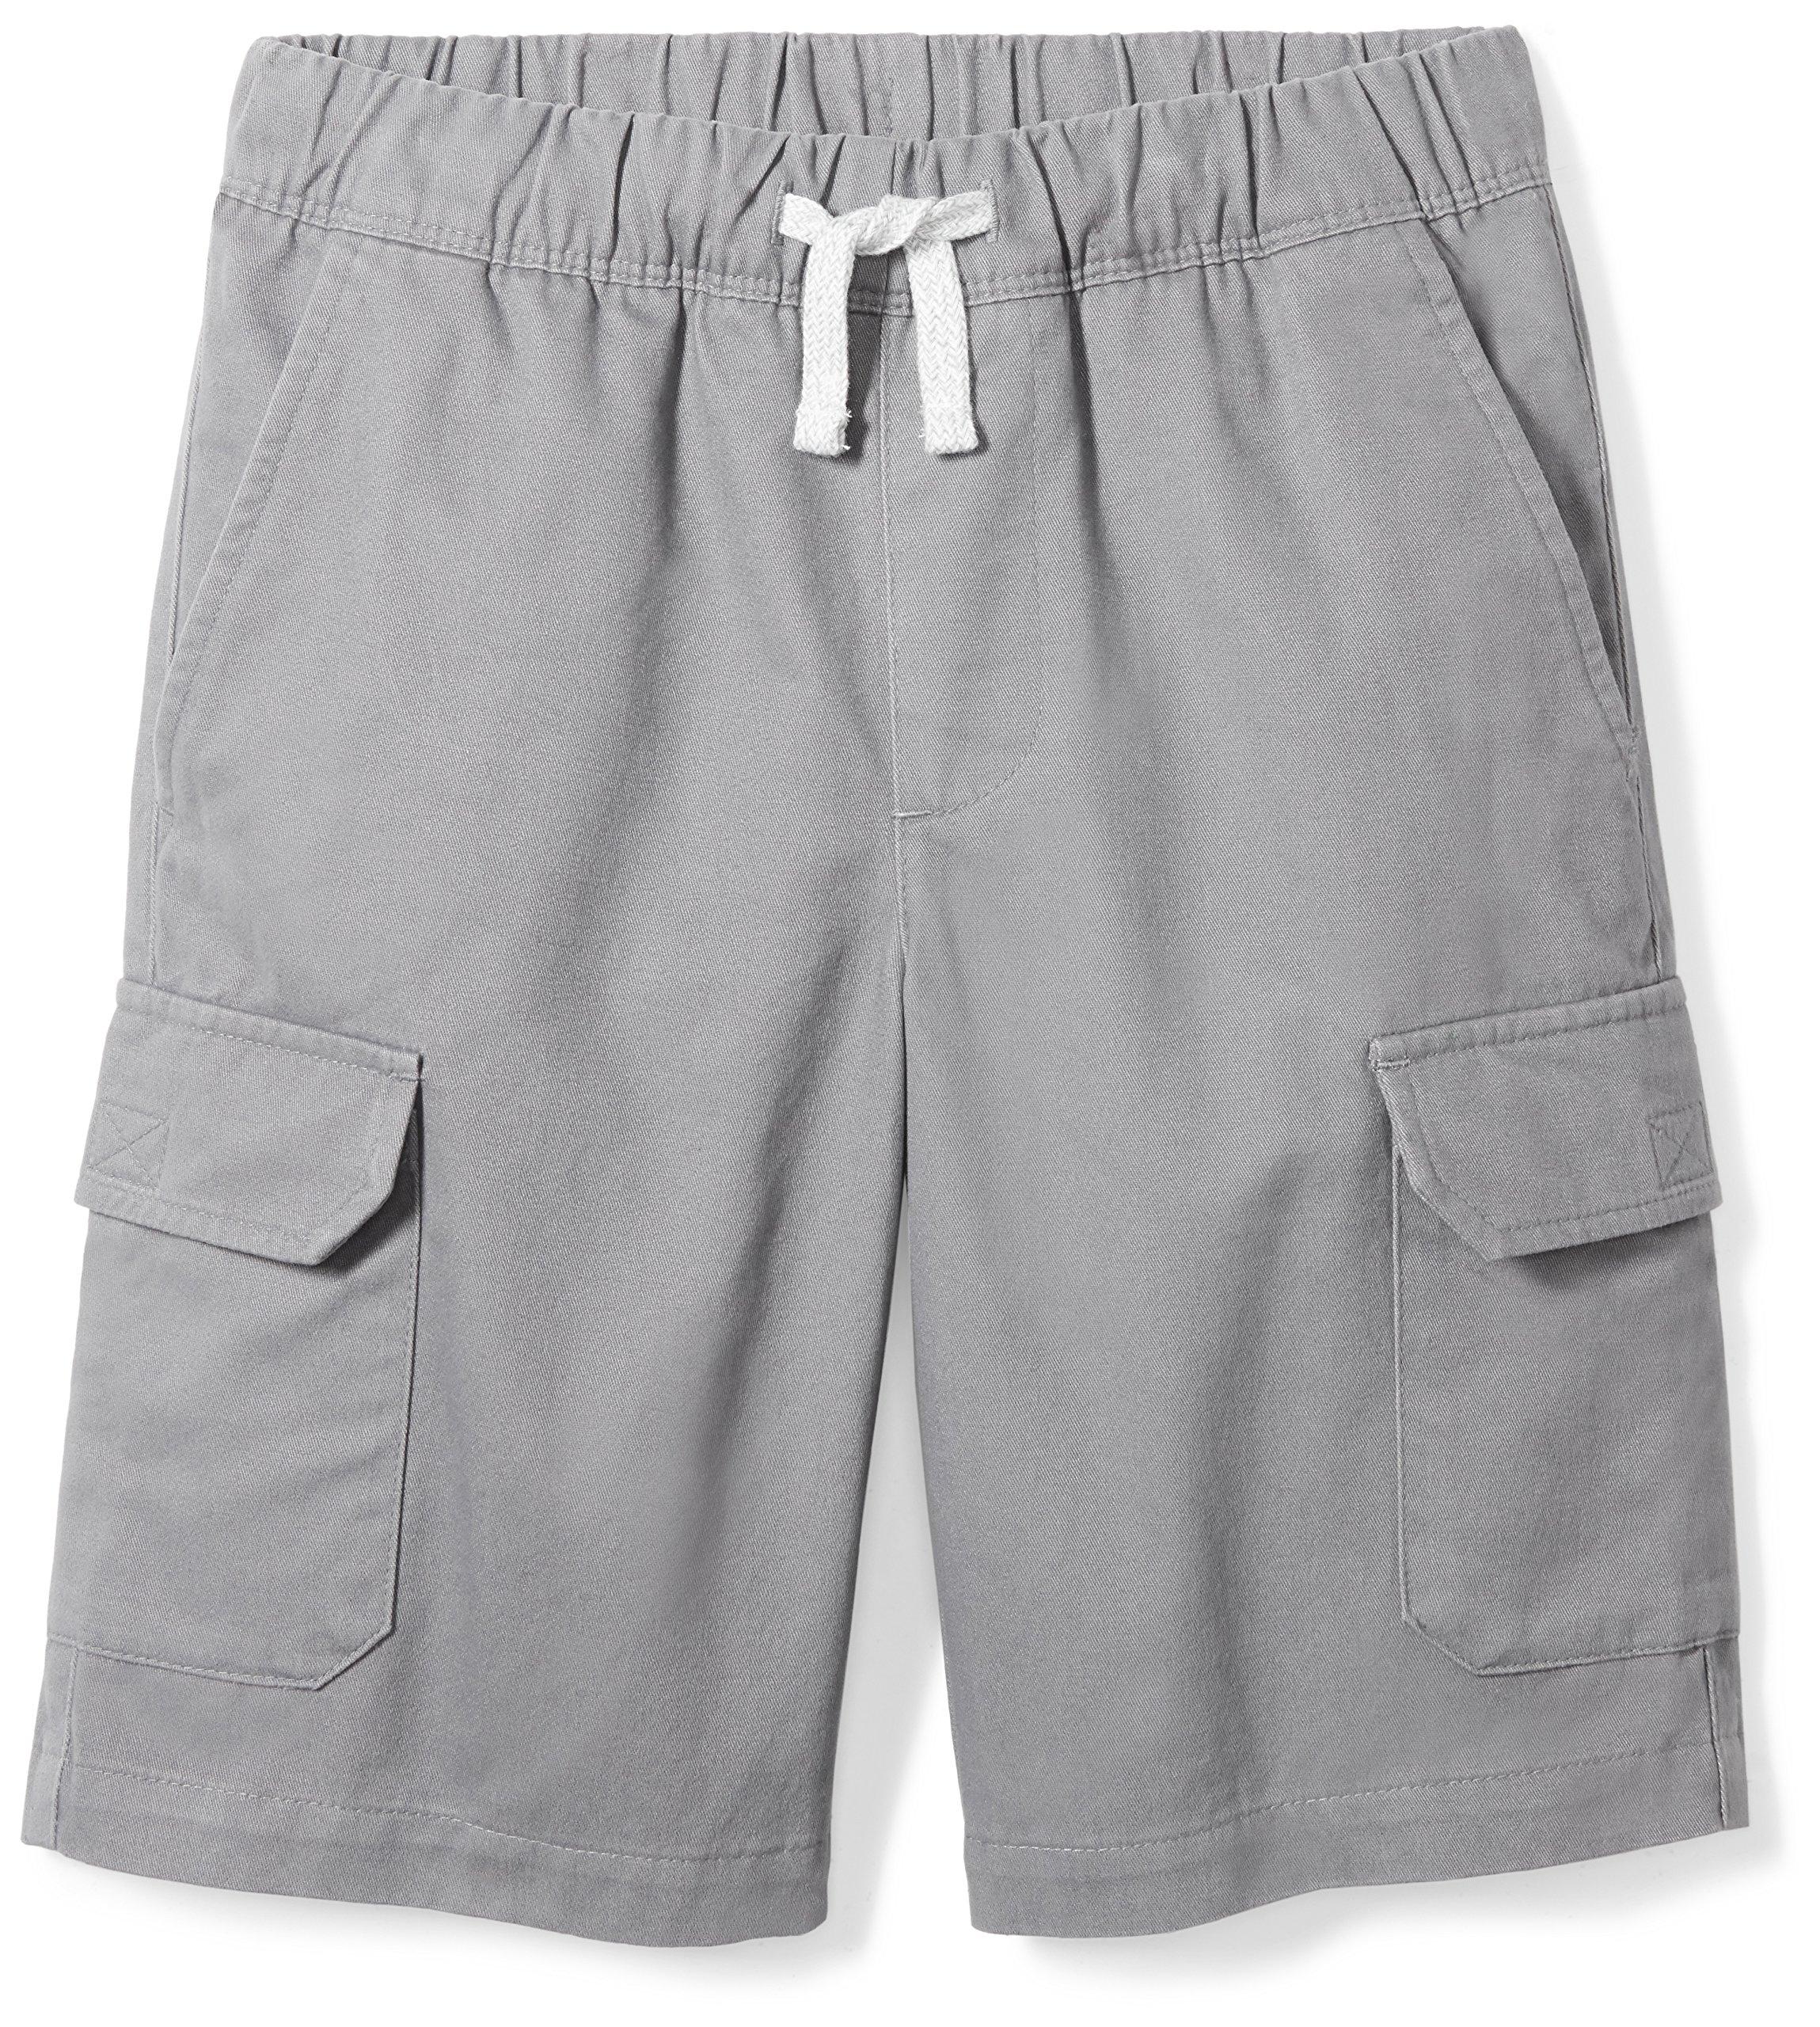 Spotted Zebra Boys' Little Cargo Shorts, Grey, Small (6-7)